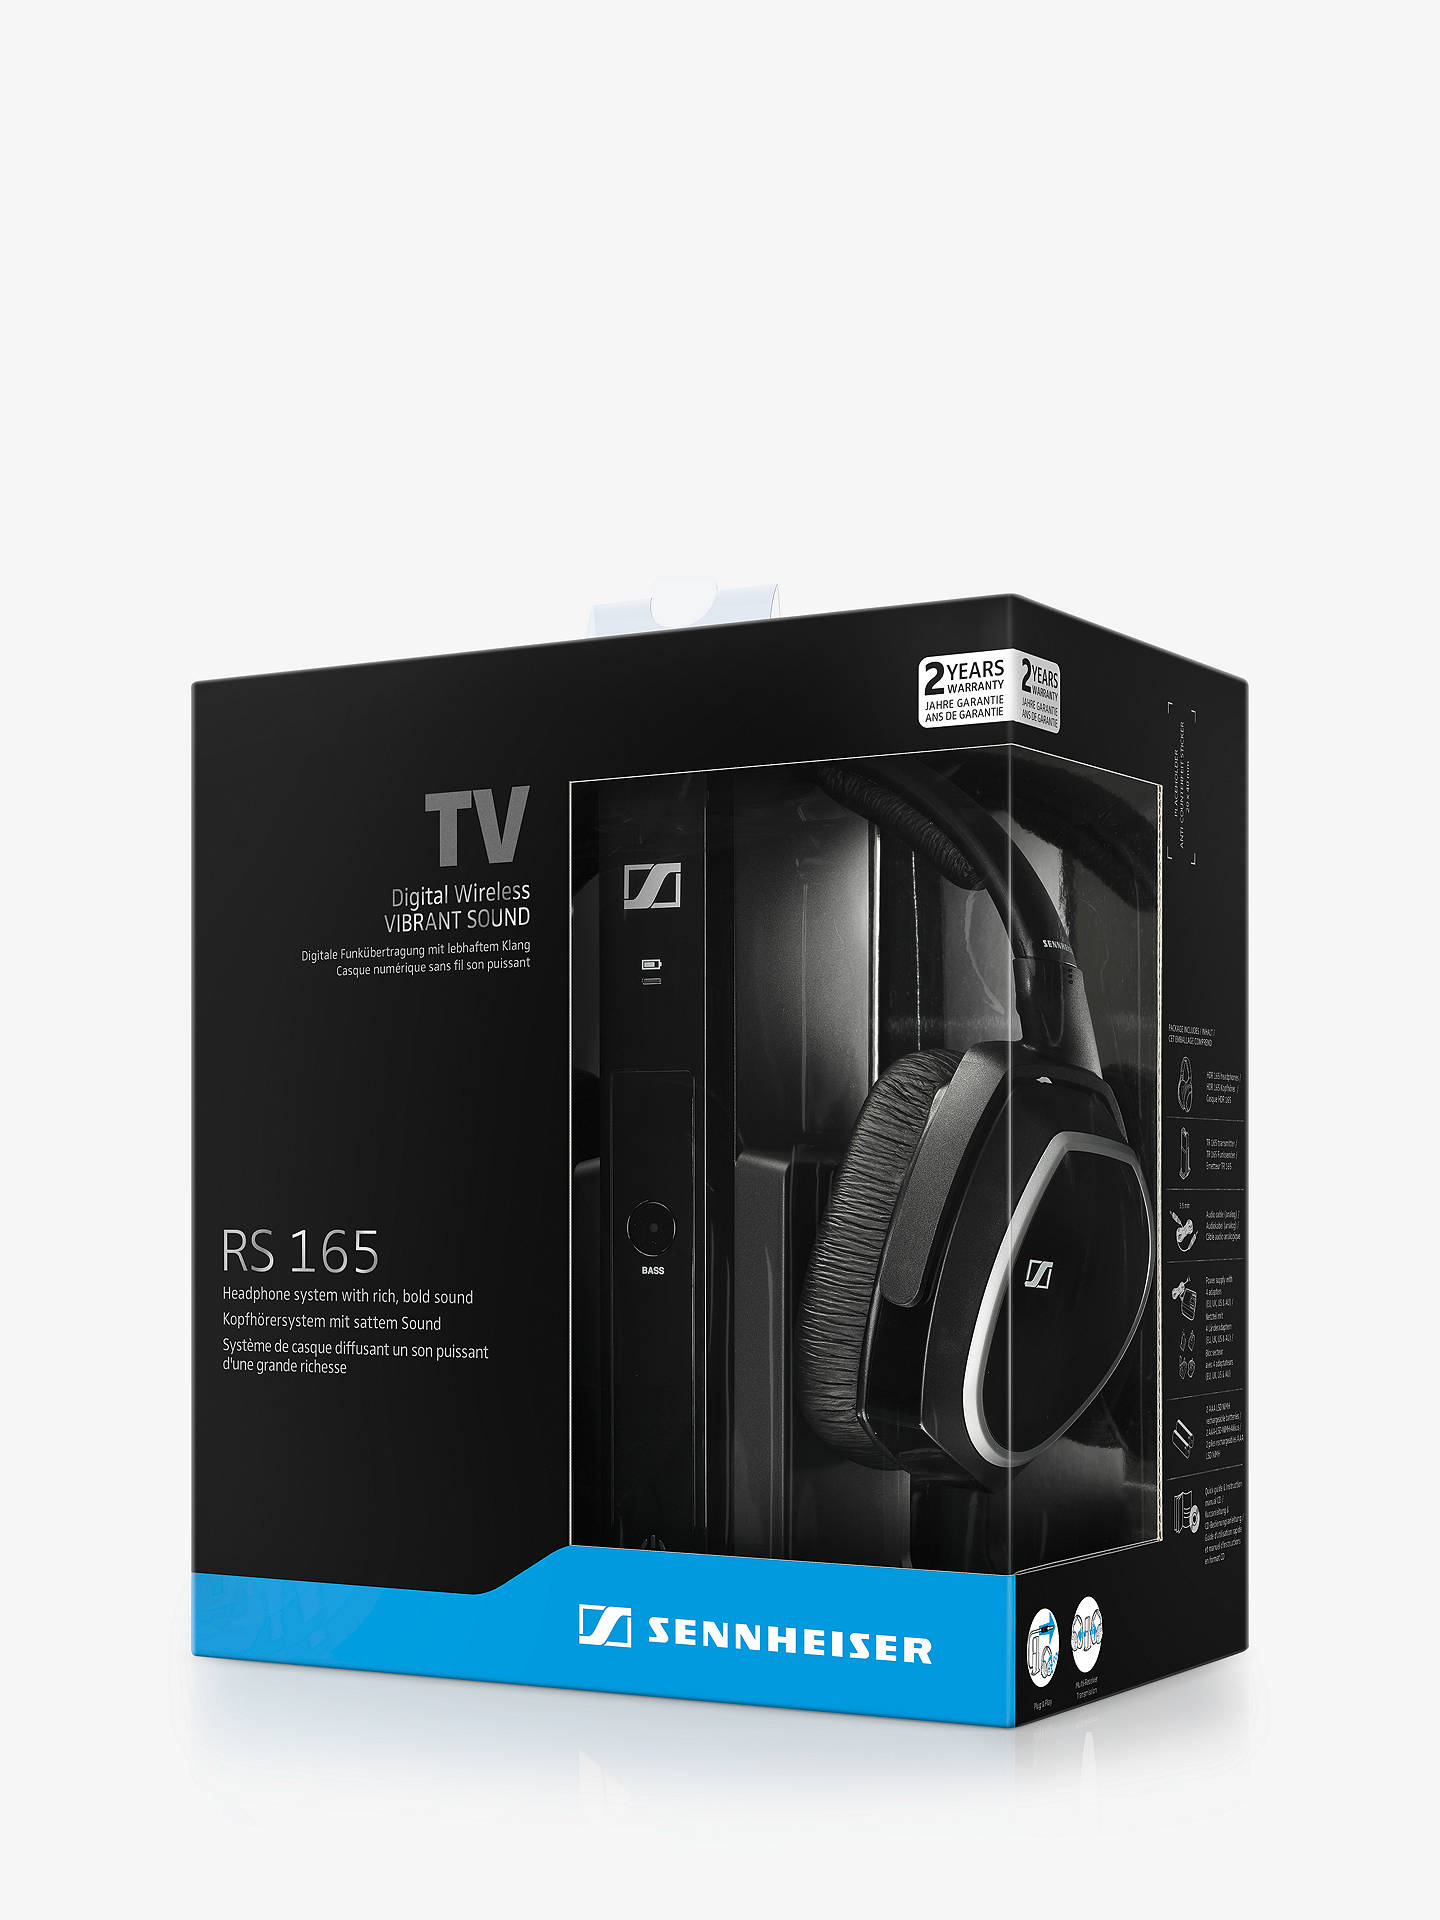 Sennheiser Rs165 Wireless Over Ear Digital Headphones At John Lewis